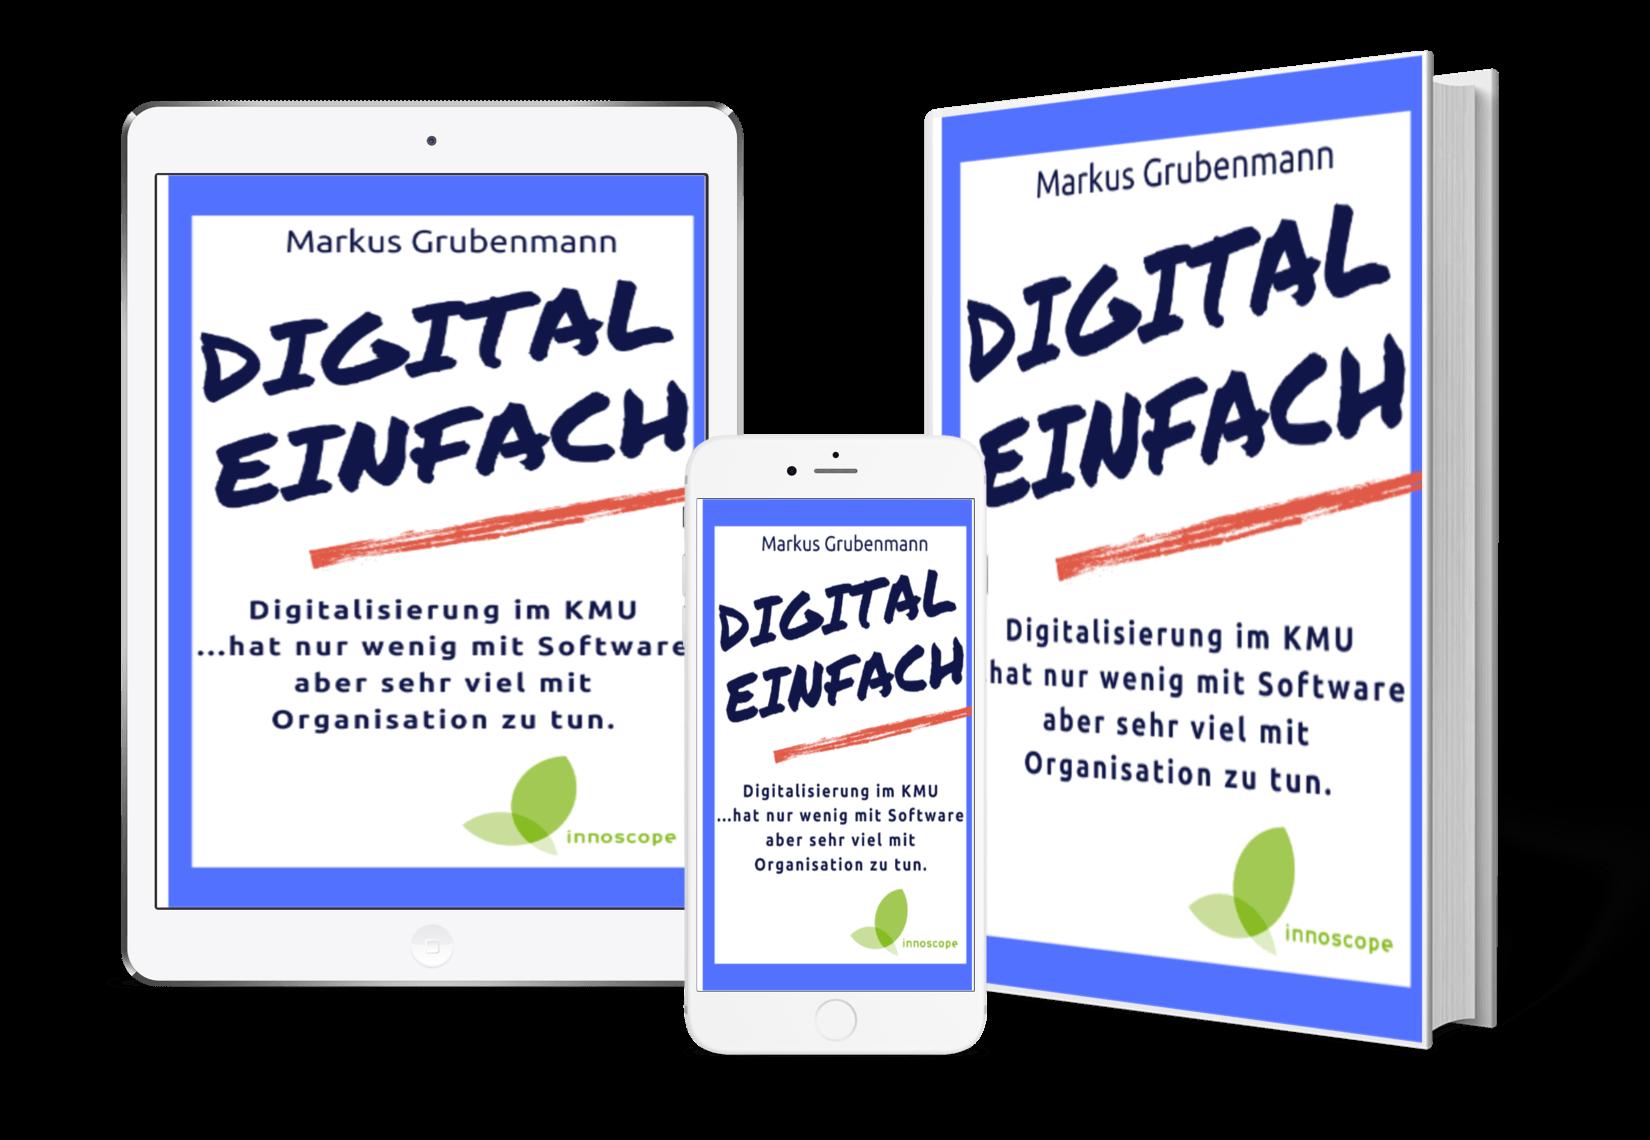 Digitaler Erfolg im Kleinbetrieb